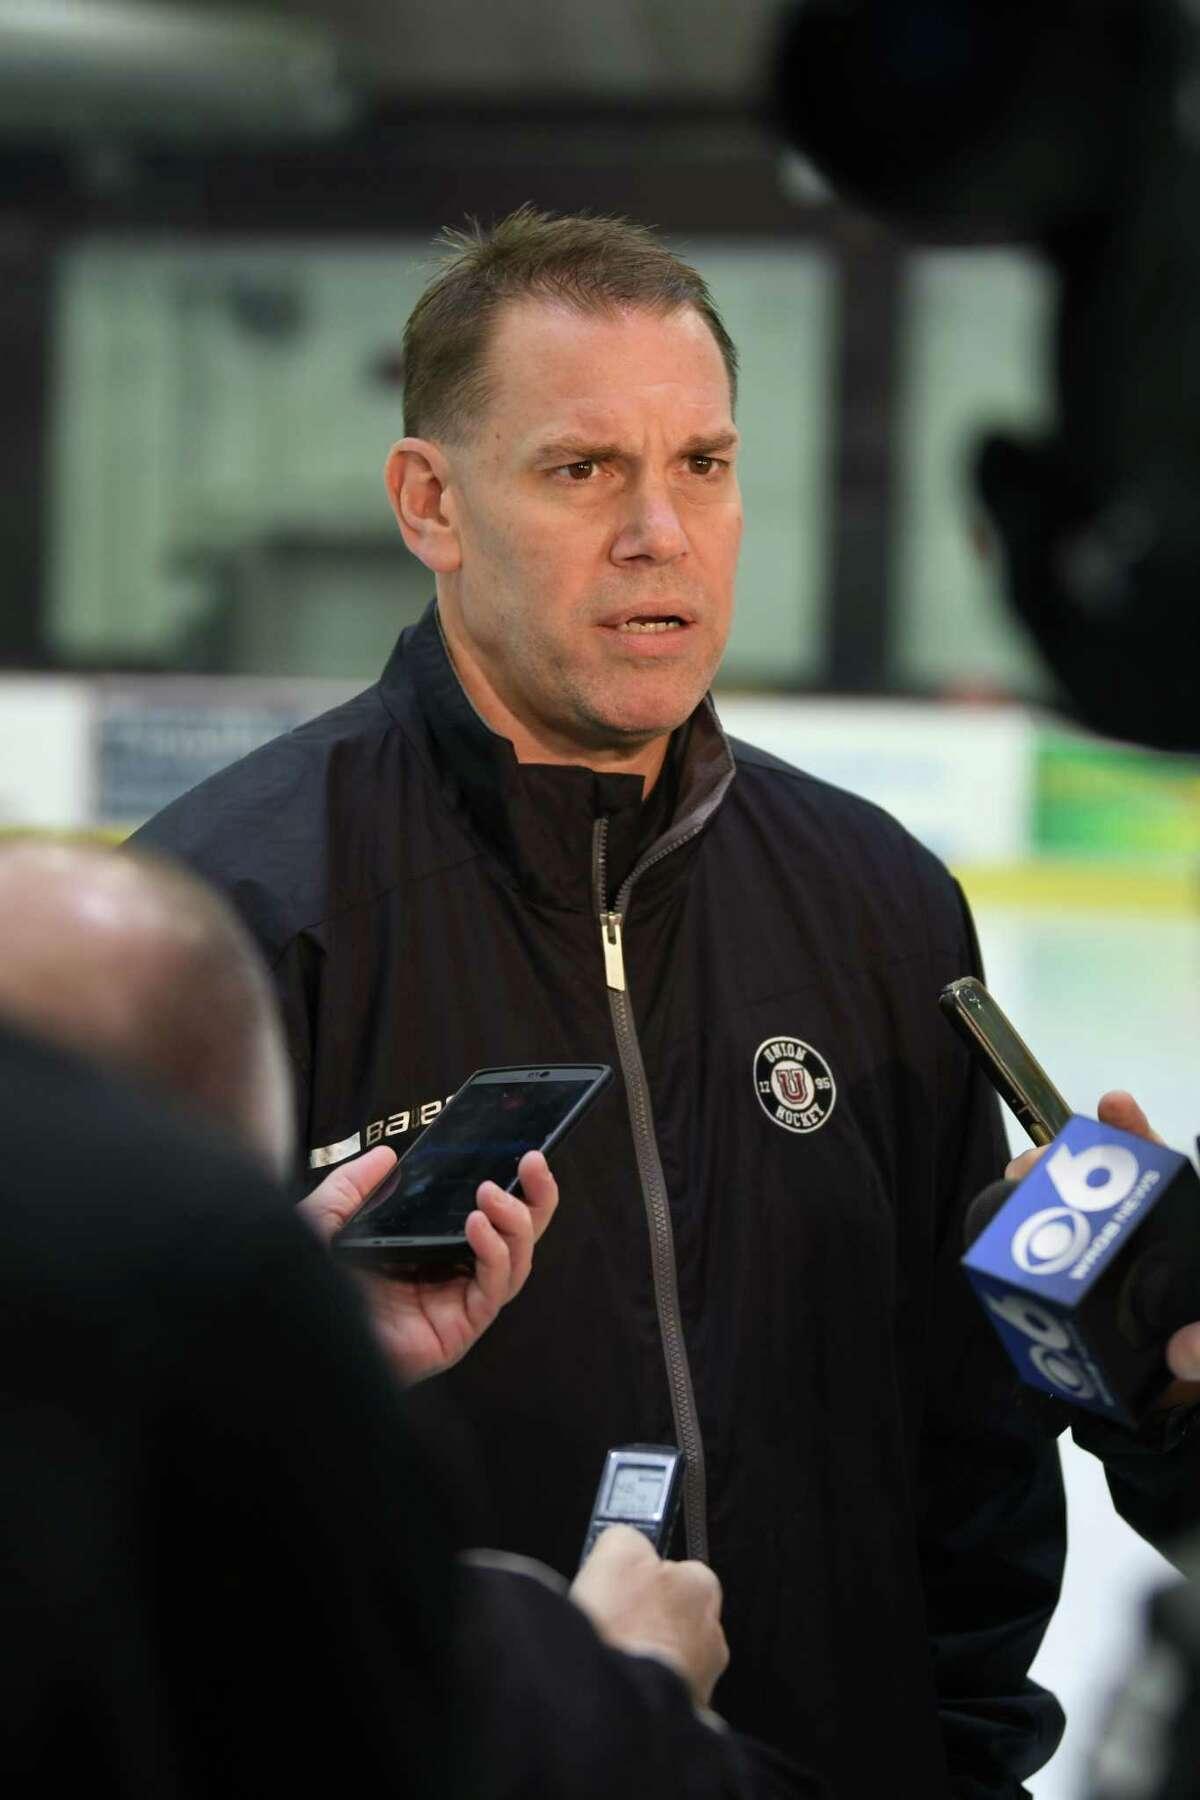 Union College men's hockey head coach Rick Bennett talks to reporters on media day Tuesday, Oct. 2, 2018 in Schenectady, N.Y. (Lori Van Buren/Times Union)